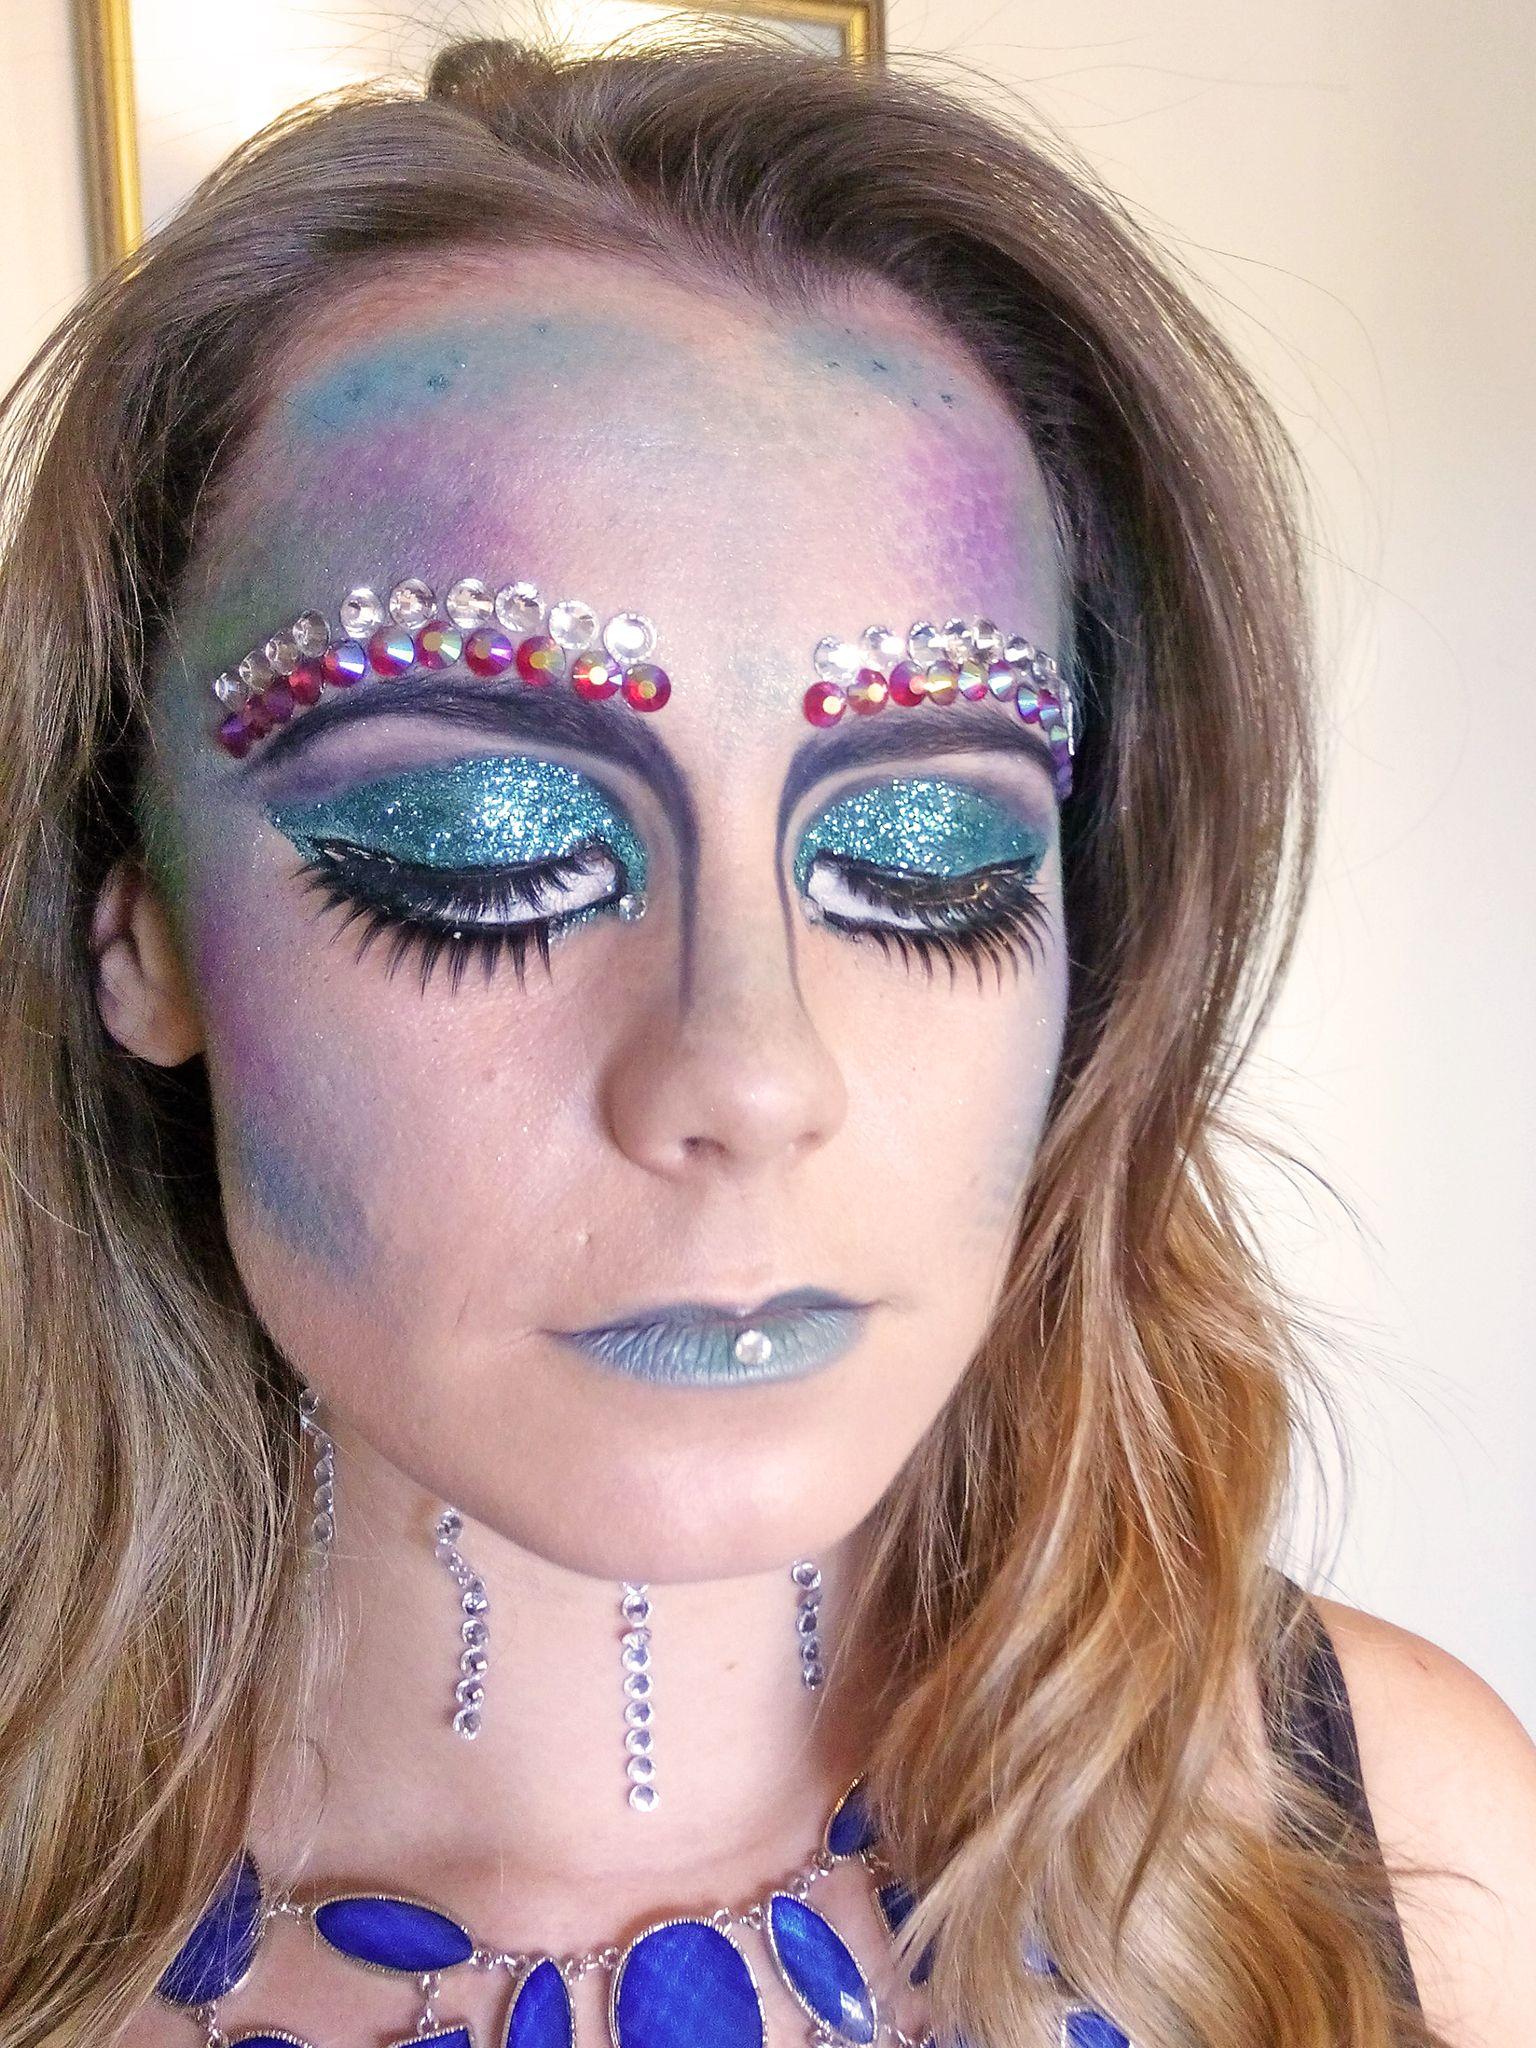 Chantal shows off Ruby's final eye makeup Special Occasion Makeup, Makeup Class, Makeup Designs